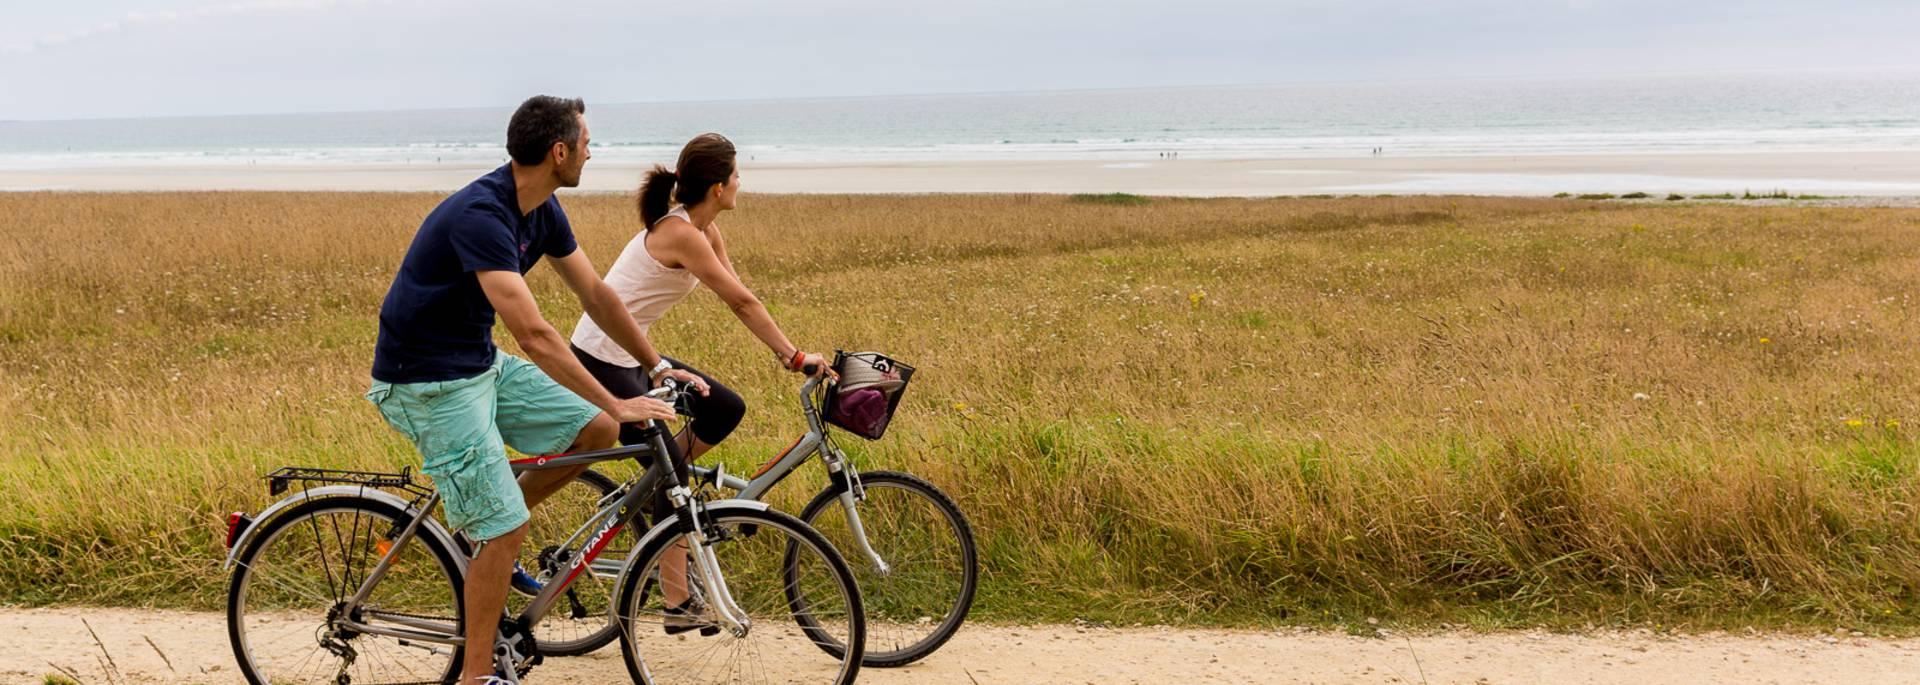 A vélo sur la littorale © Y Derennes